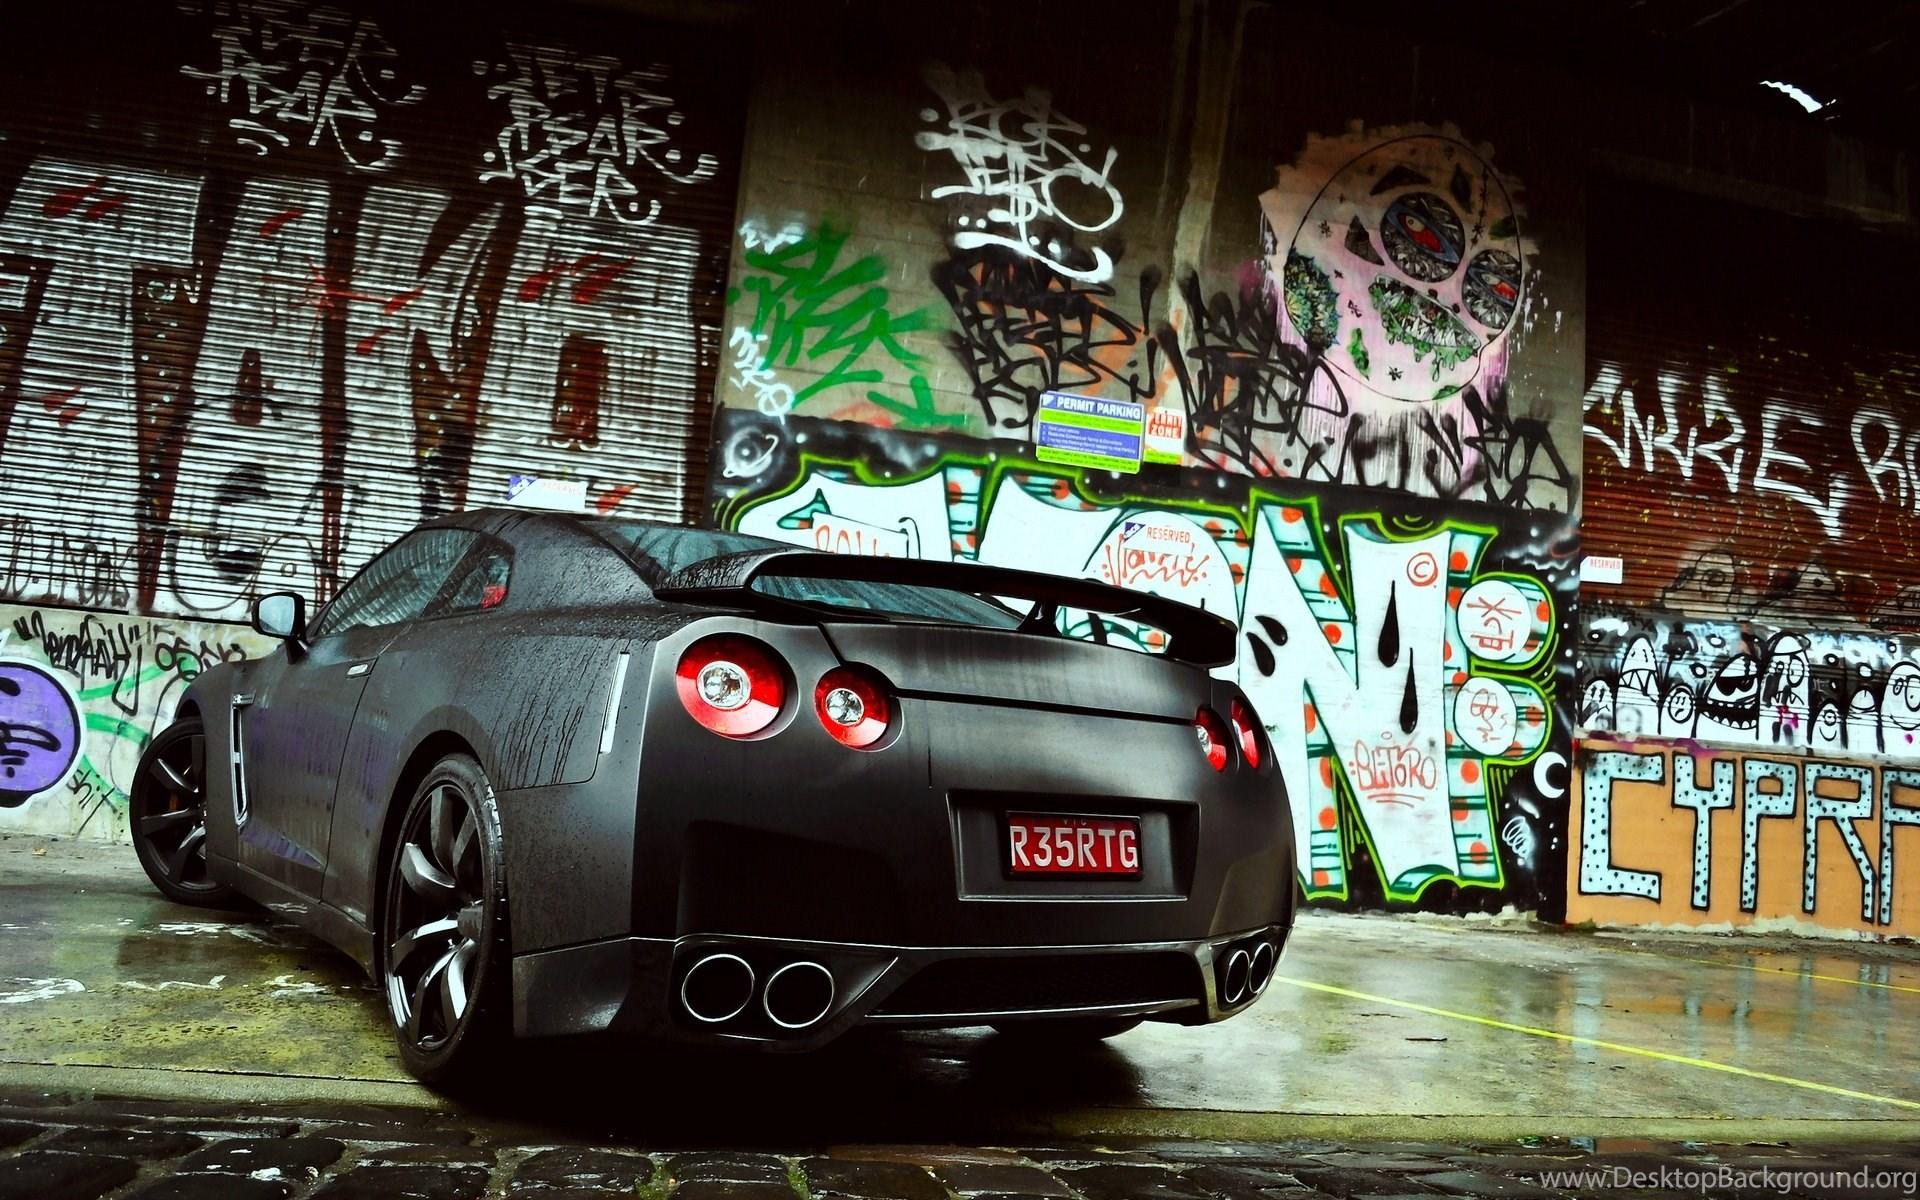 Nissan Gtr Wallpapers Hd Wallpapers Hd 4k Wallpapers 4k Desktop Background